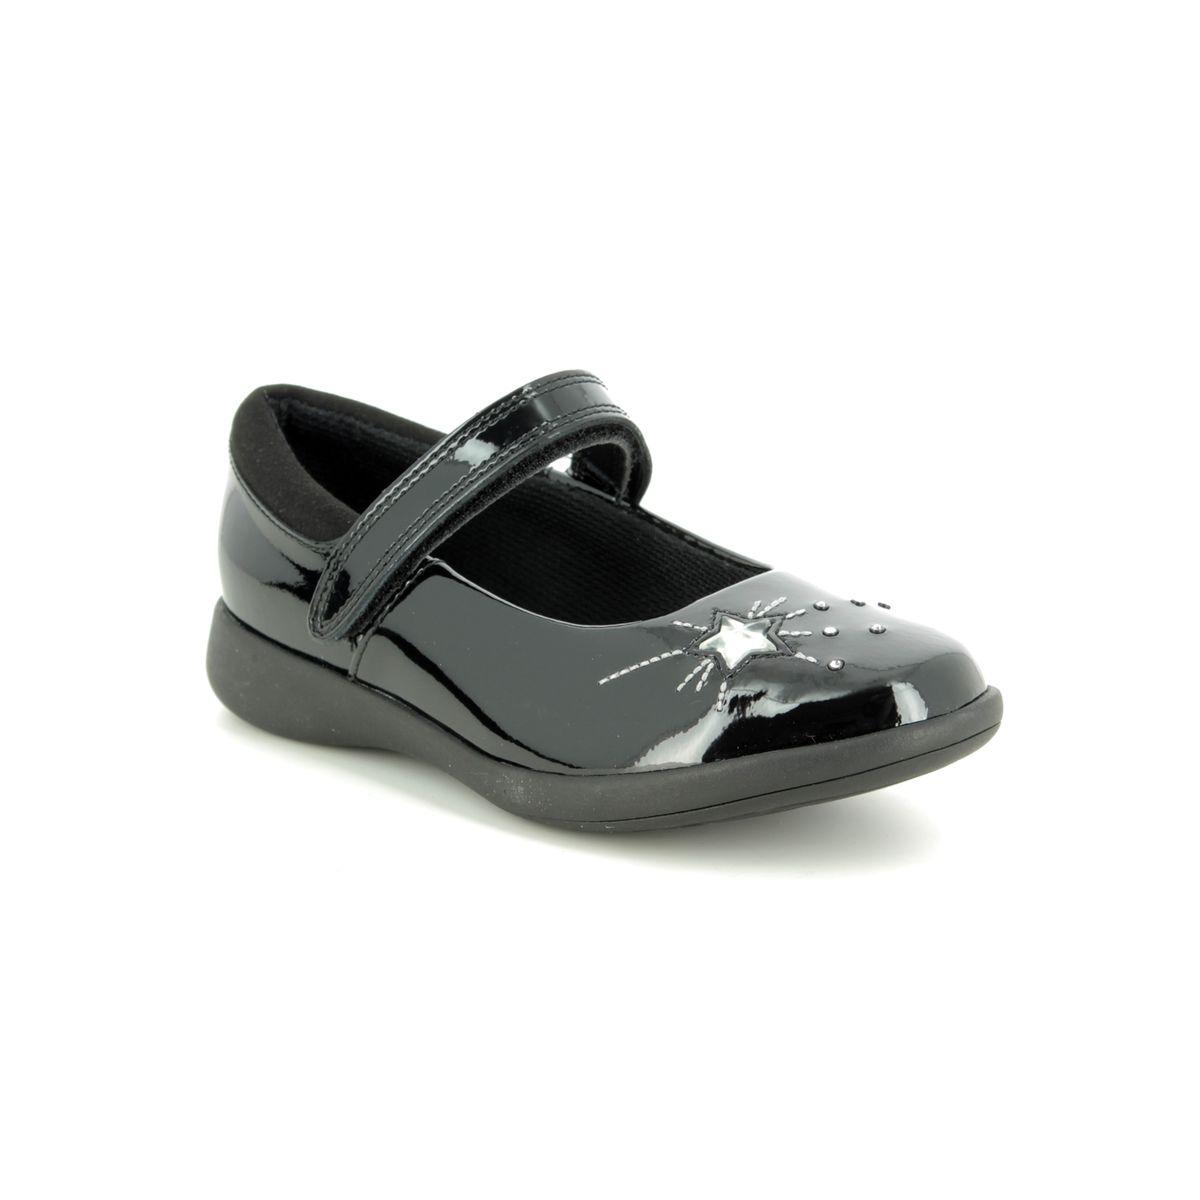 fdabdfee 469806f Etch Spark K at Begg Shoes & Bags